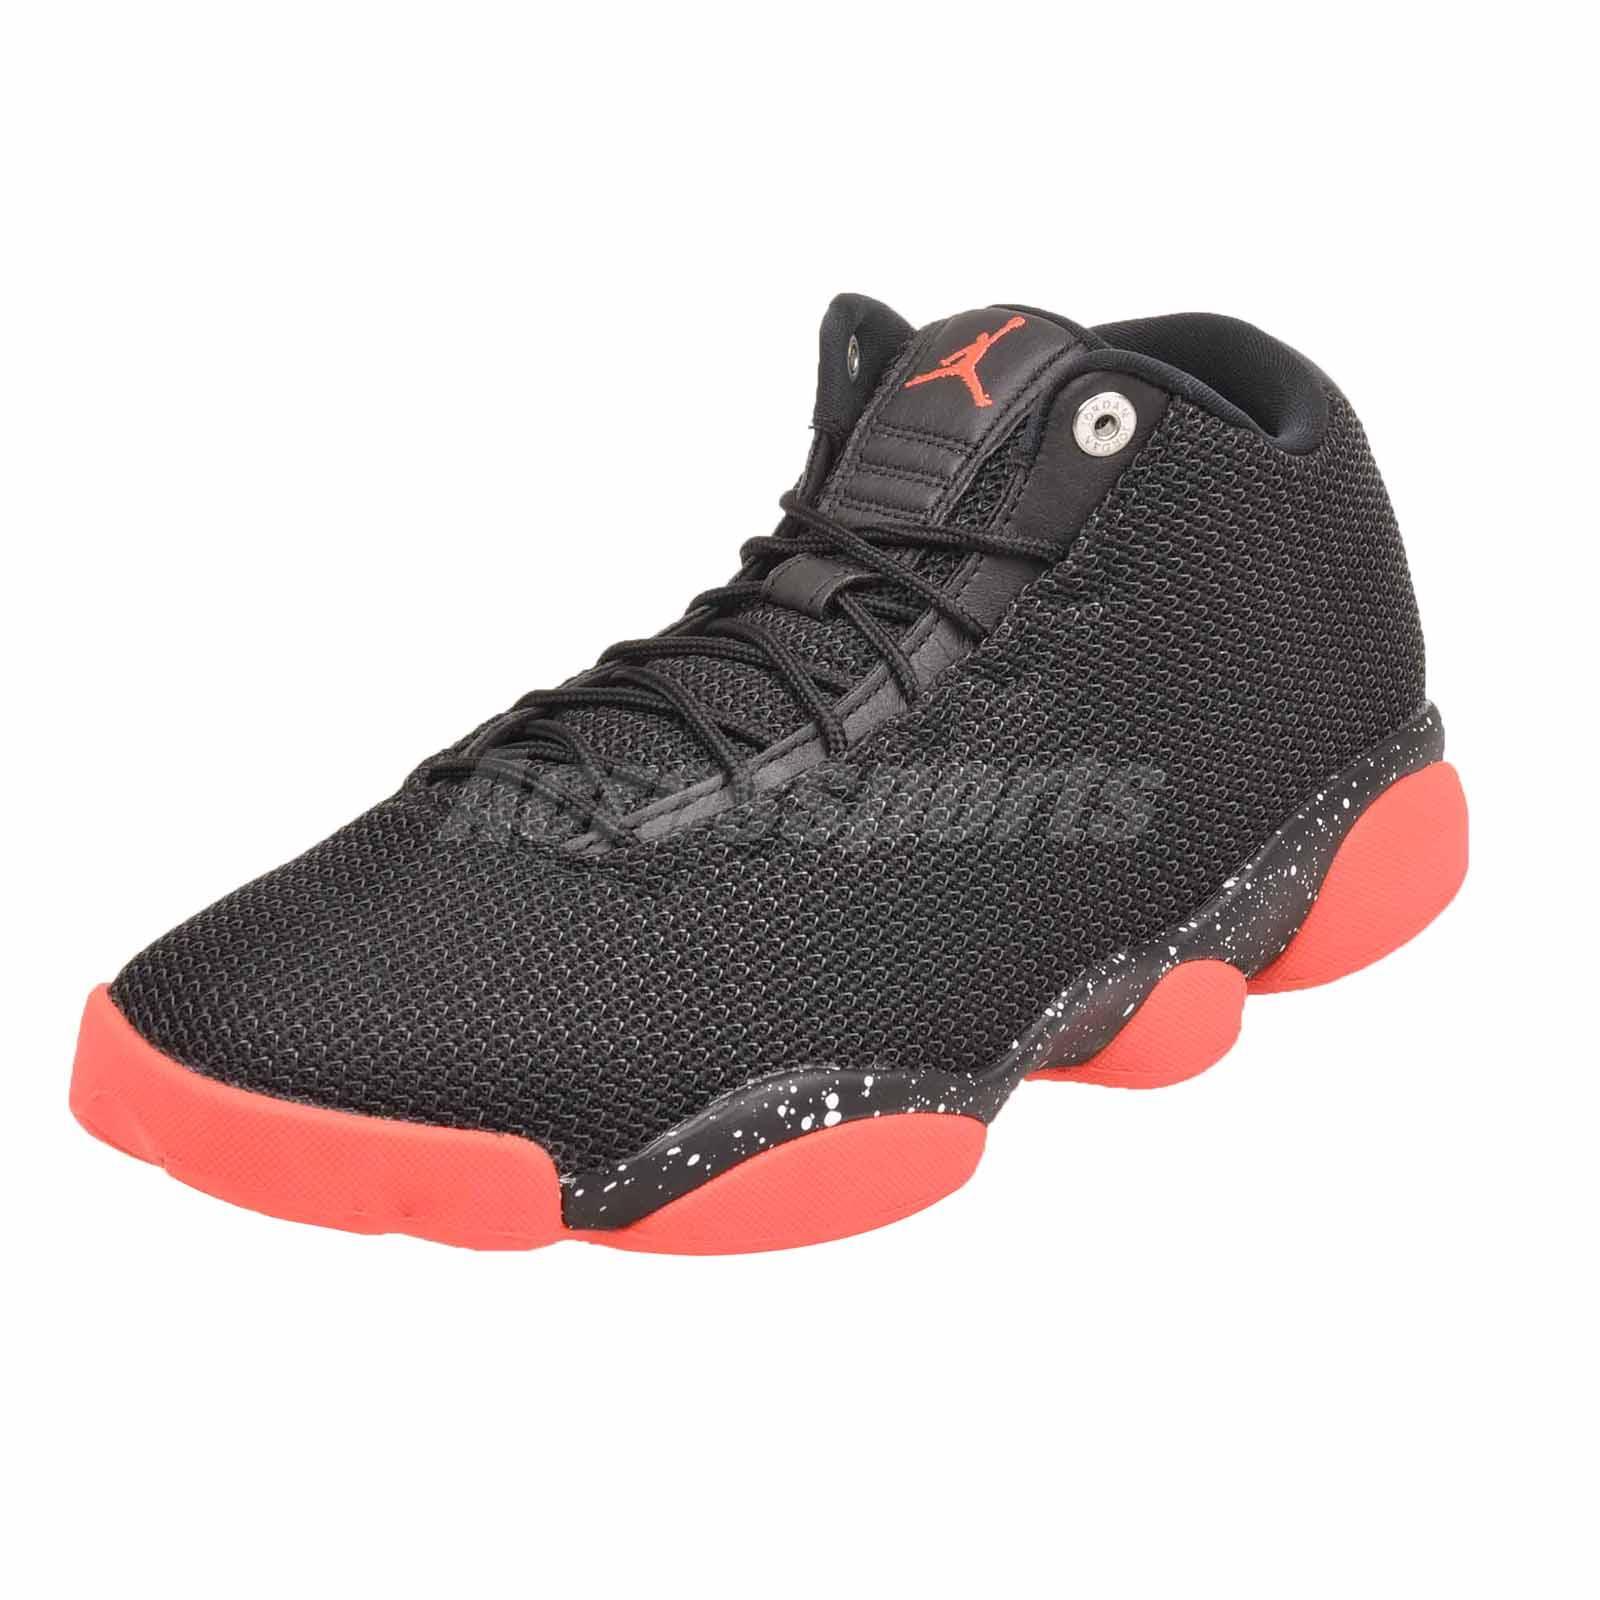 sports shoes 5ae74 a7848 Nike Jordan Horizon Low Basketball Mens Shoes Black Air Infrared 23 ...